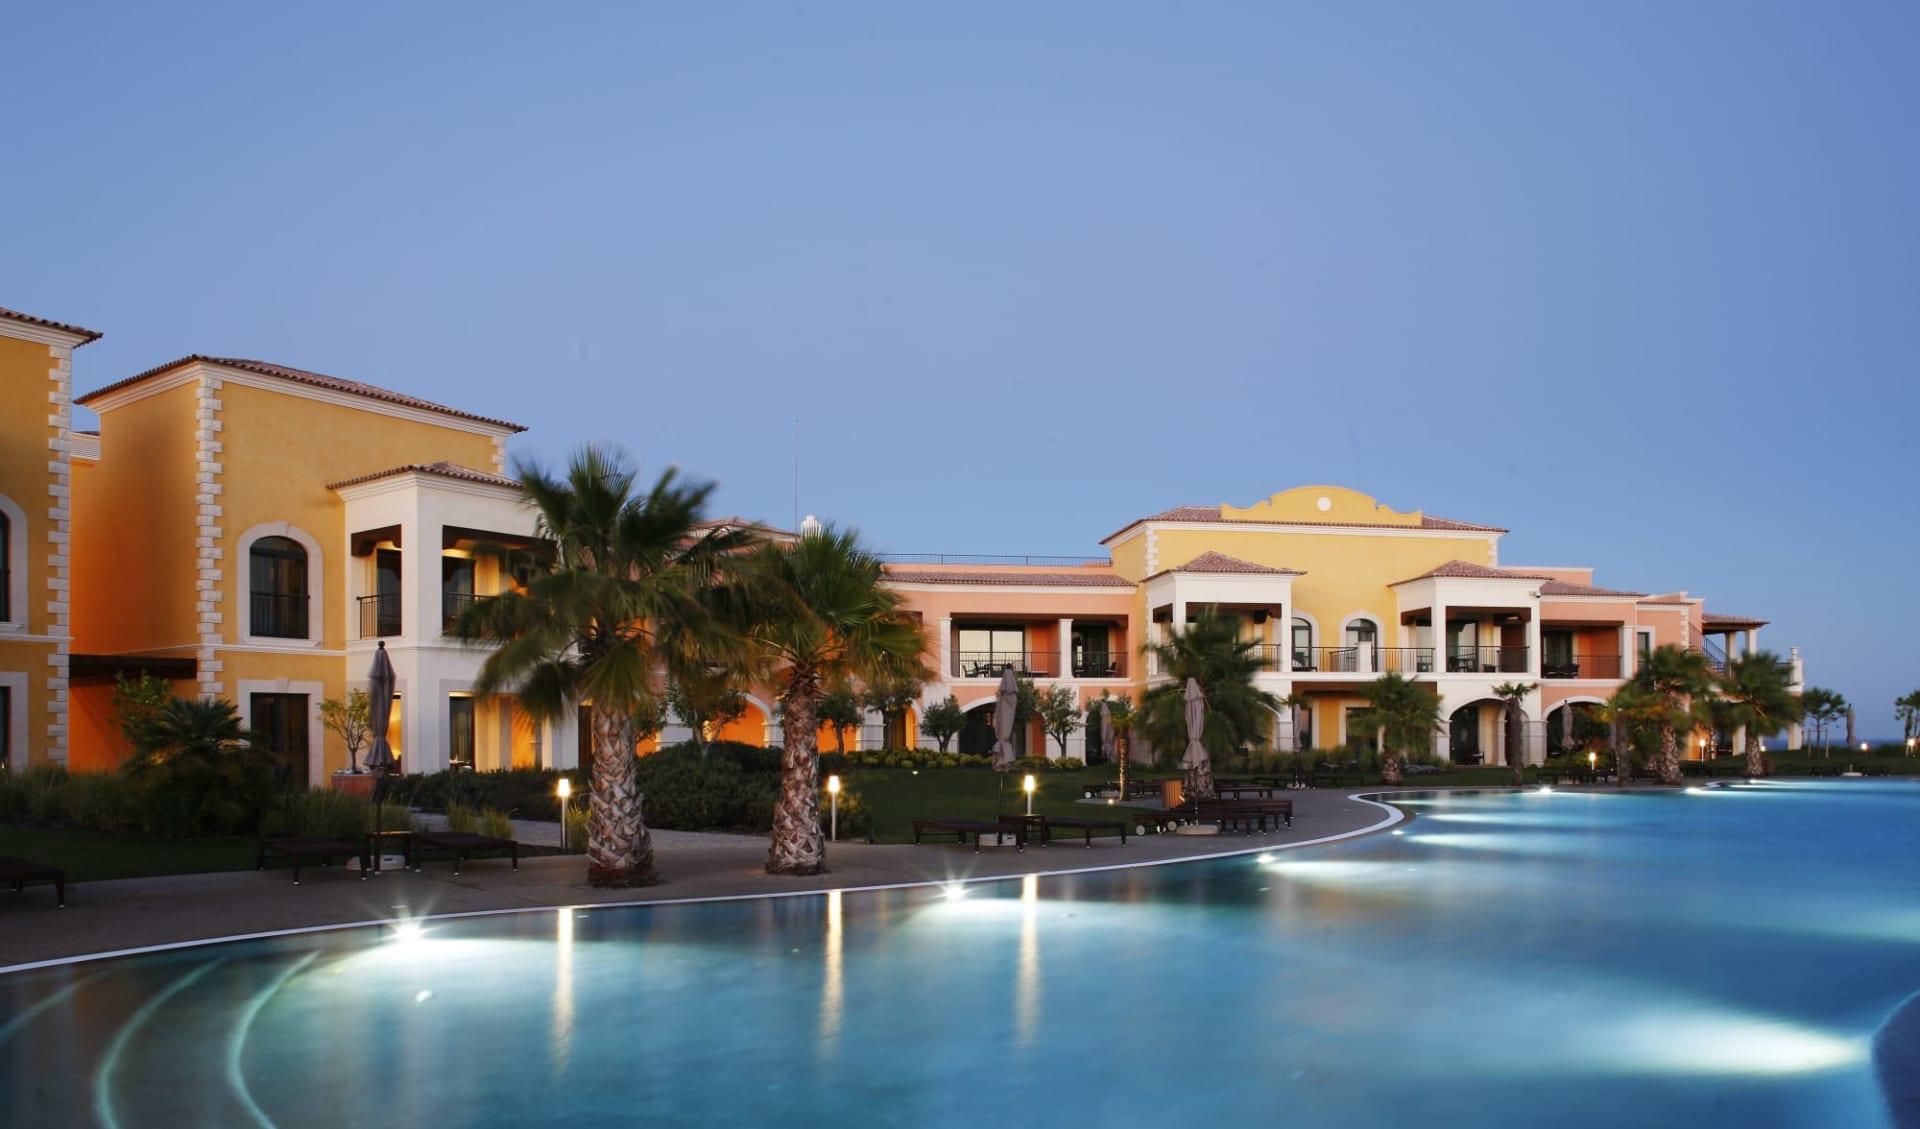 Cascade Wellness & Lifestyle Resort in Lagos: Cascade Wellness & Lifestyle Resort - Blick auf Pool und Hotel